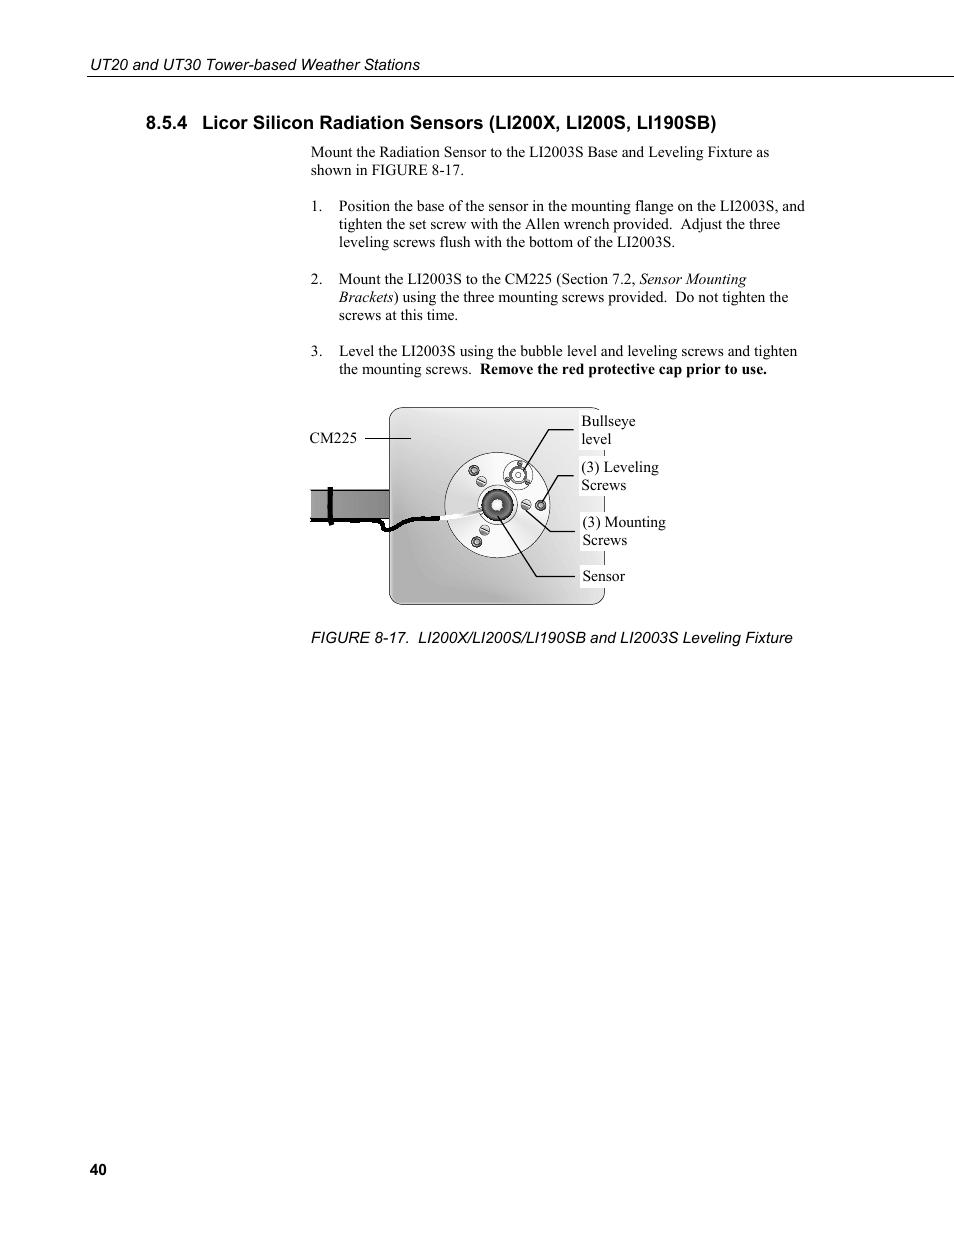 D64AE7 Lini T Ut30b User Manual | Wiring Liry on delta wiring diagram, sundance wiring diagram, roadrunner wiring diagram, vip wiring diagram, laser wiring diagram, challenger wiring diagram, concord wiring diagram, suburban wiring diagram, satellite wiring diagram, luxair wiring diagram, apache wiring diagram, voyager wiring diagram, charger wiring diagram, cuda wiring diagram, scamp wiring diagram,